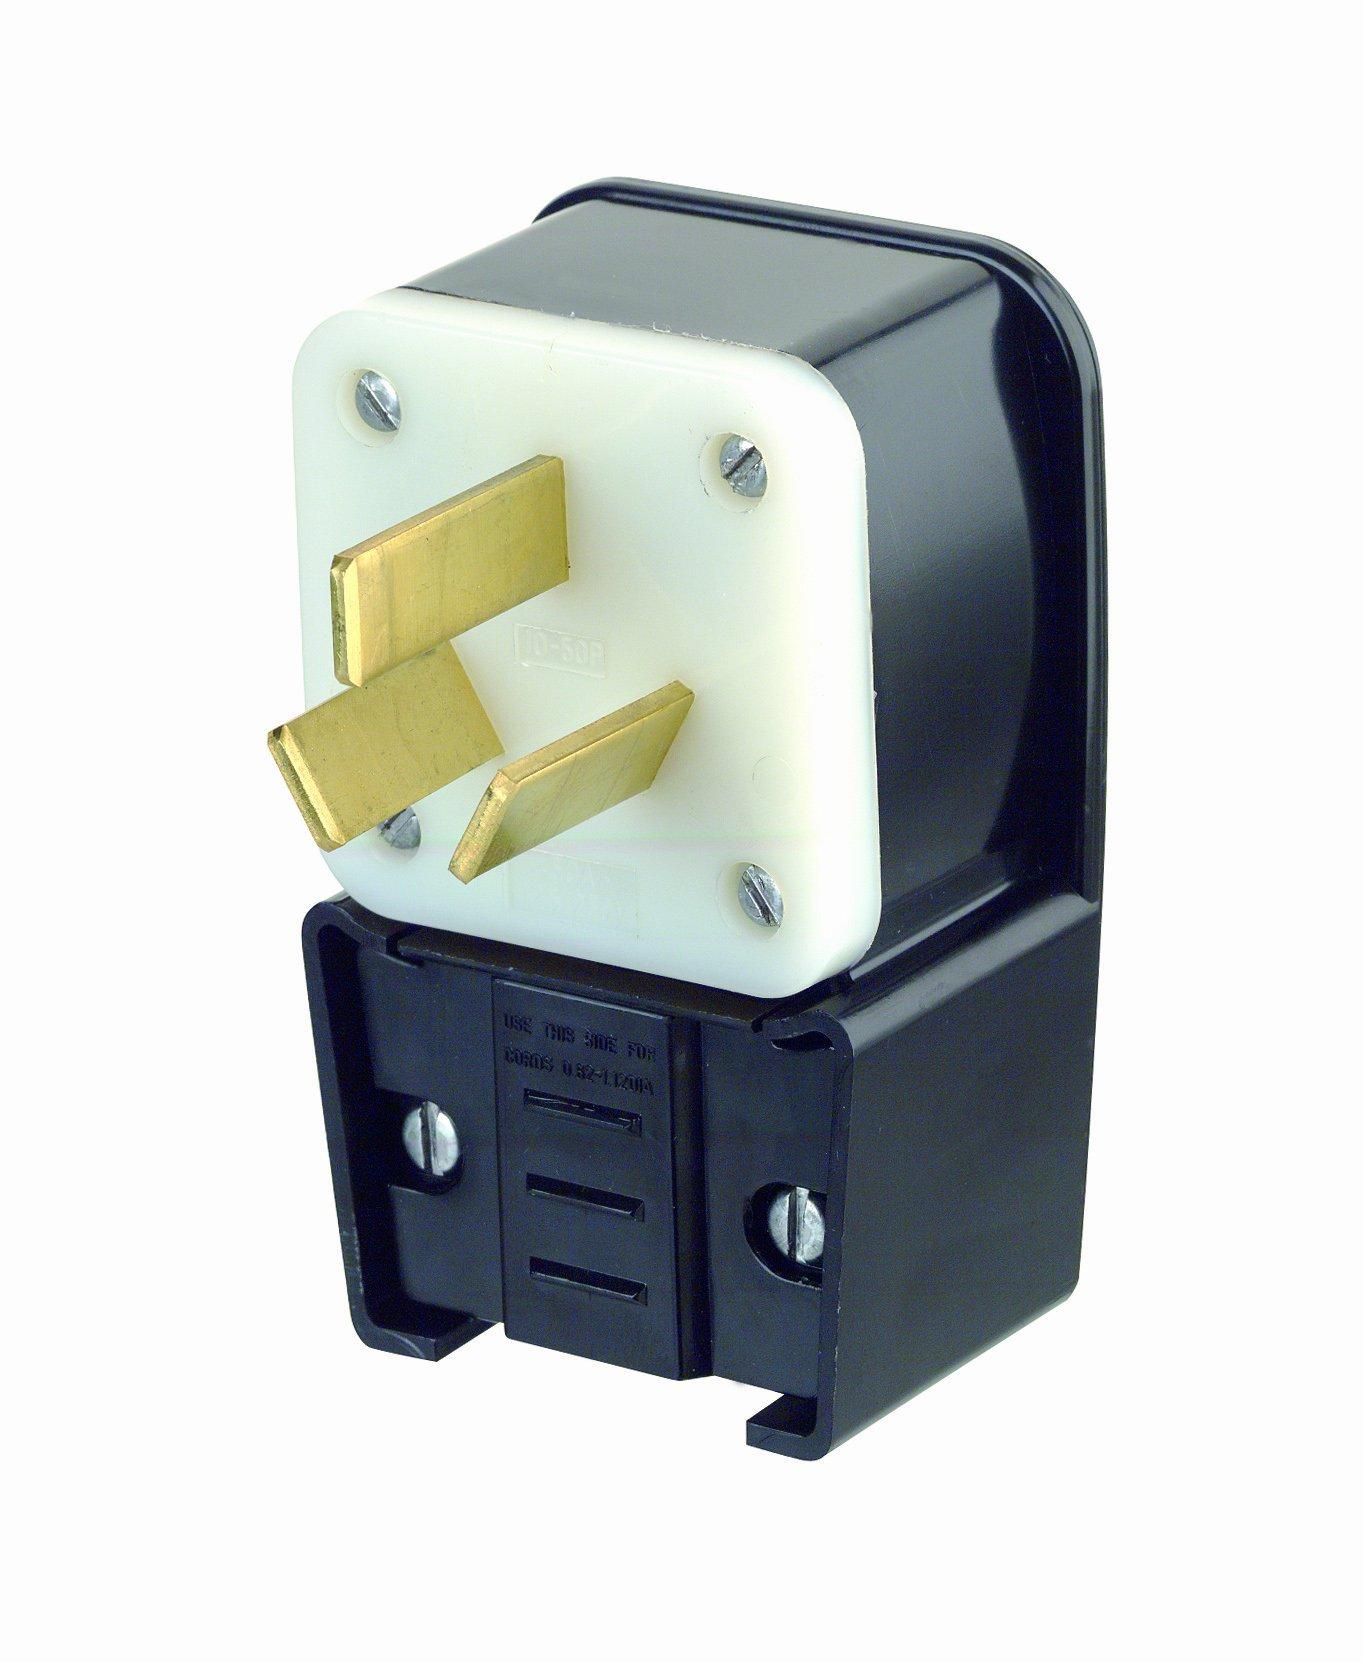 3-Pole Industrial Grade Angle Range Plug, Straight Blade, Black, Nema 10-50P, 125/250 Volts, 50 Amps